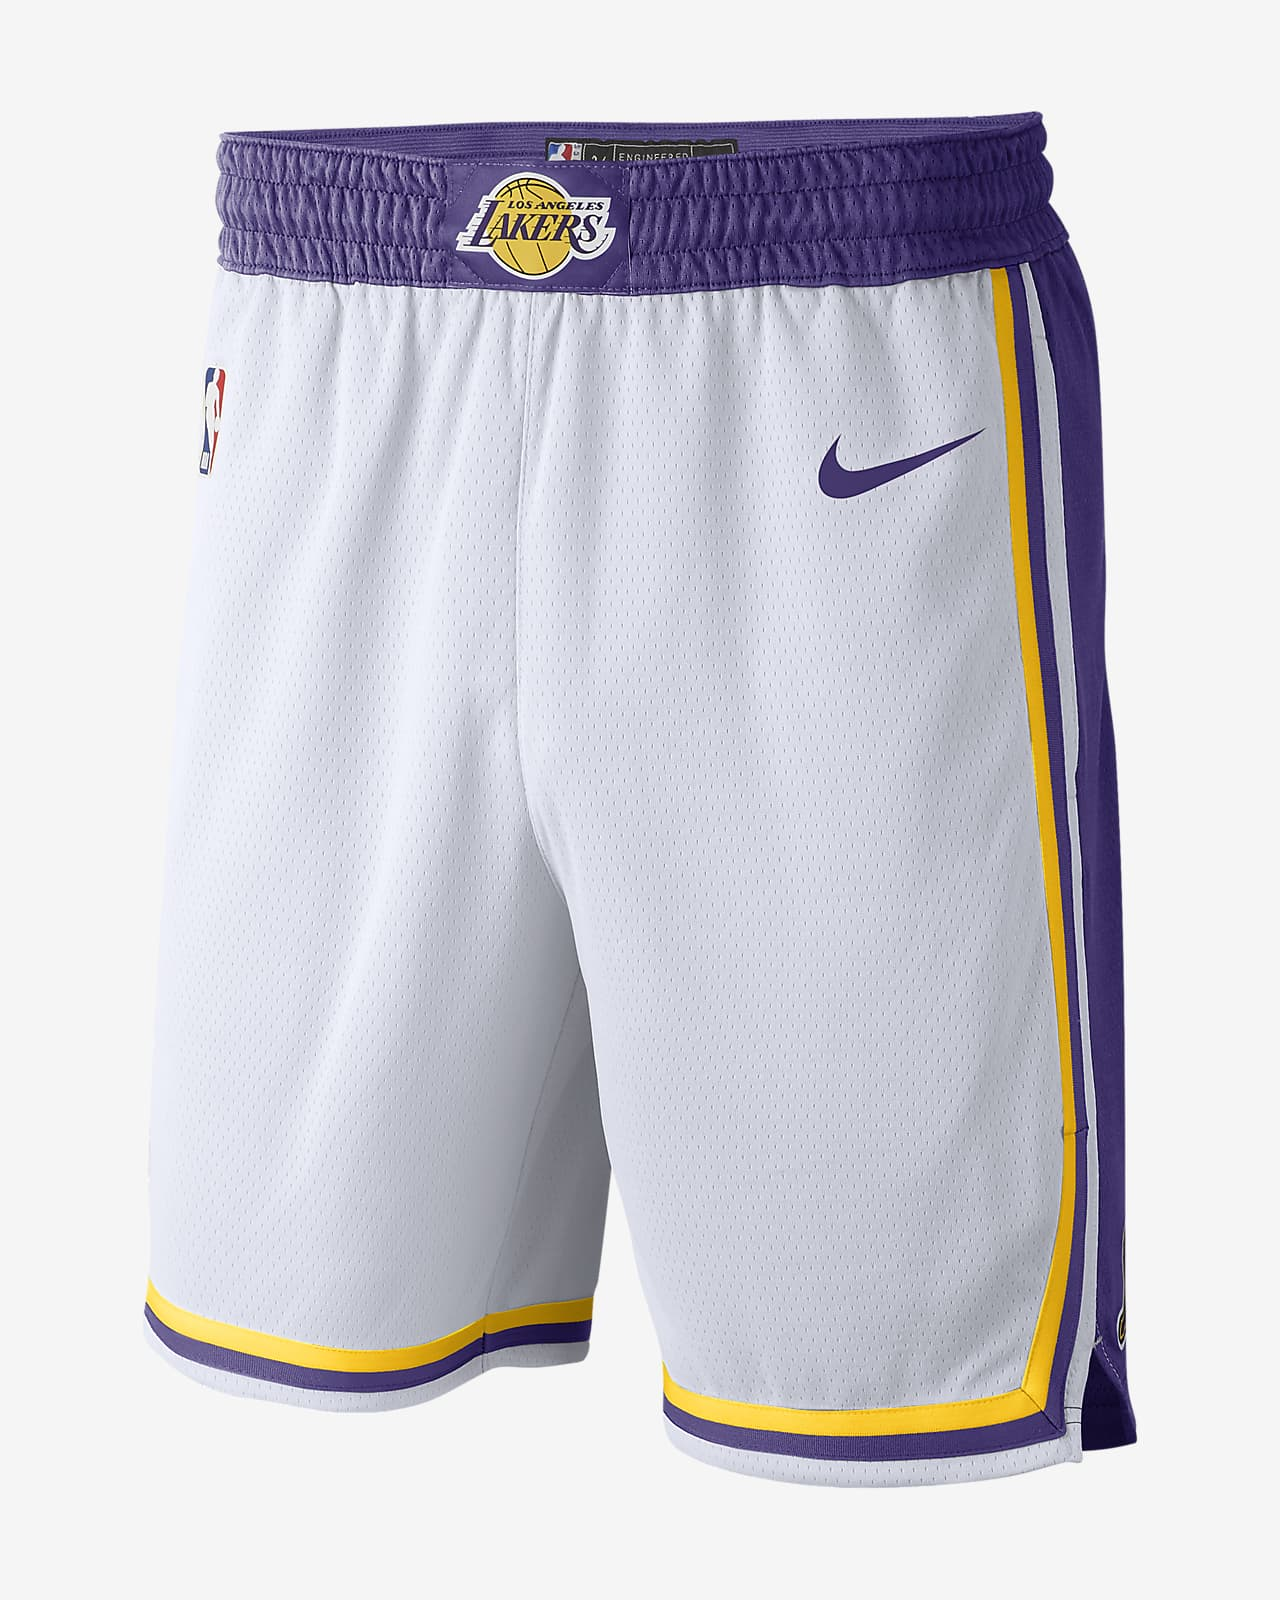 Los Angeles Lakers Men's Nike NBA Swingman Shorts